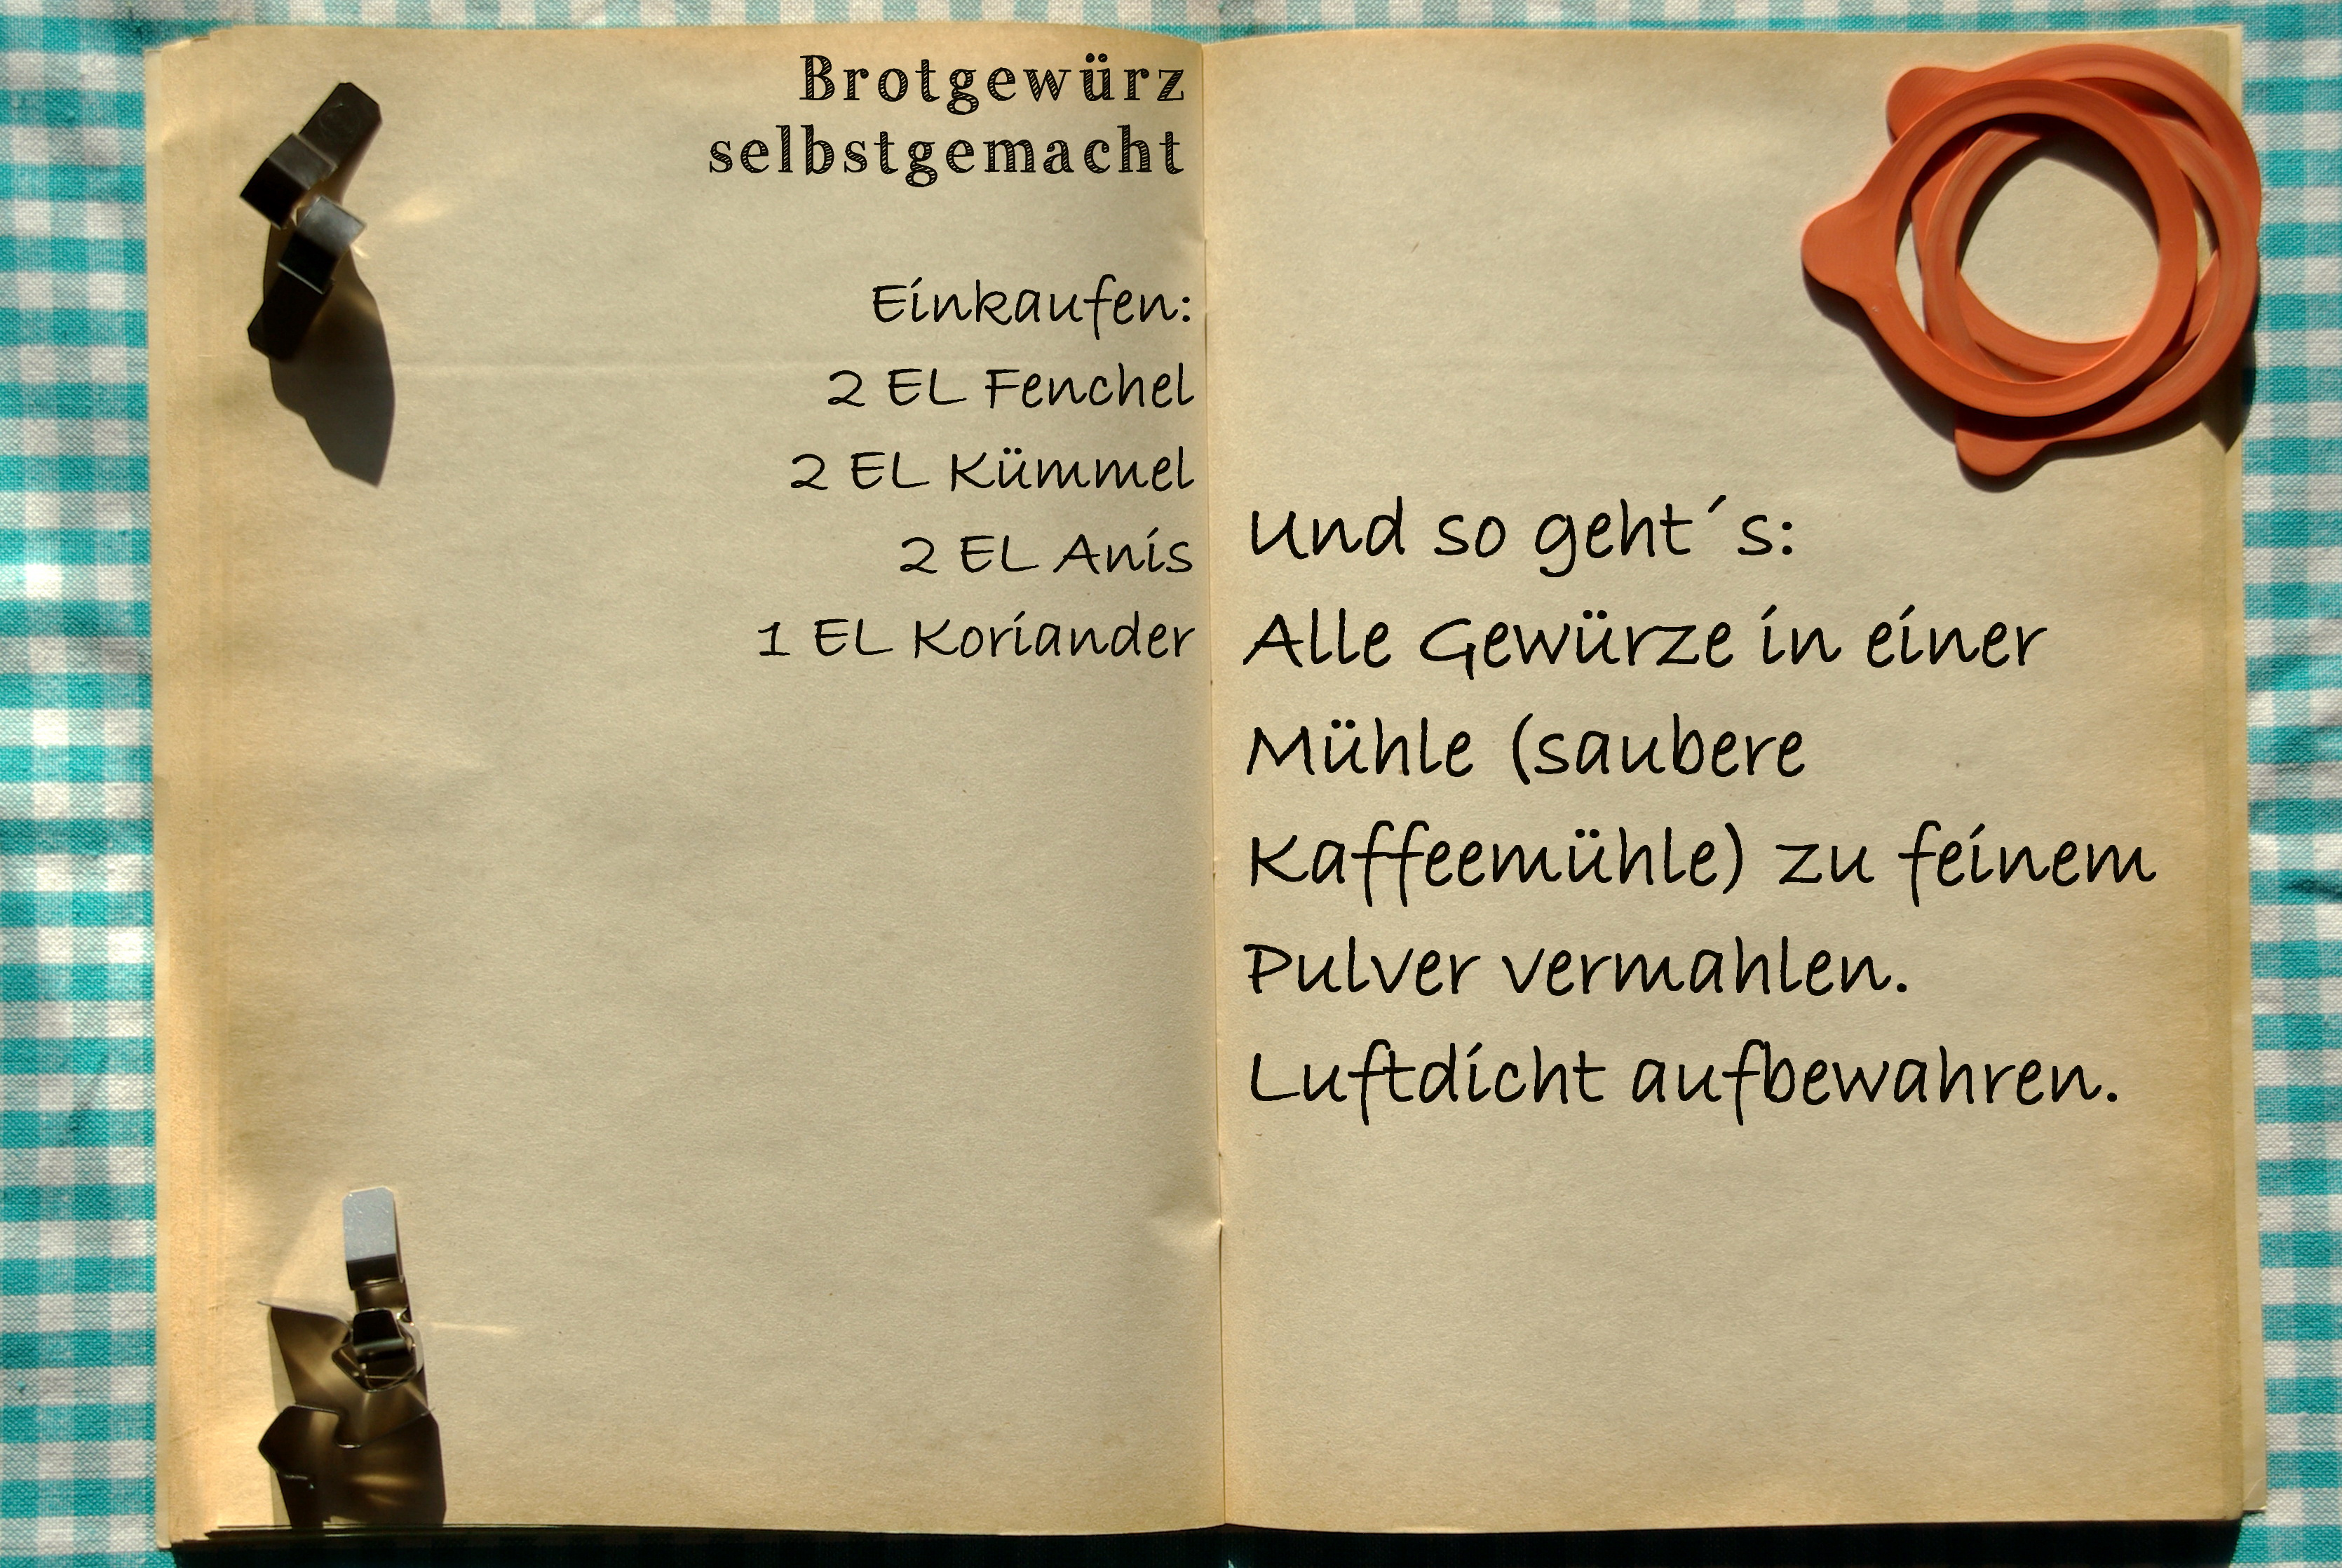 Einkaufszettel Brotgewürz by Glasgefluester